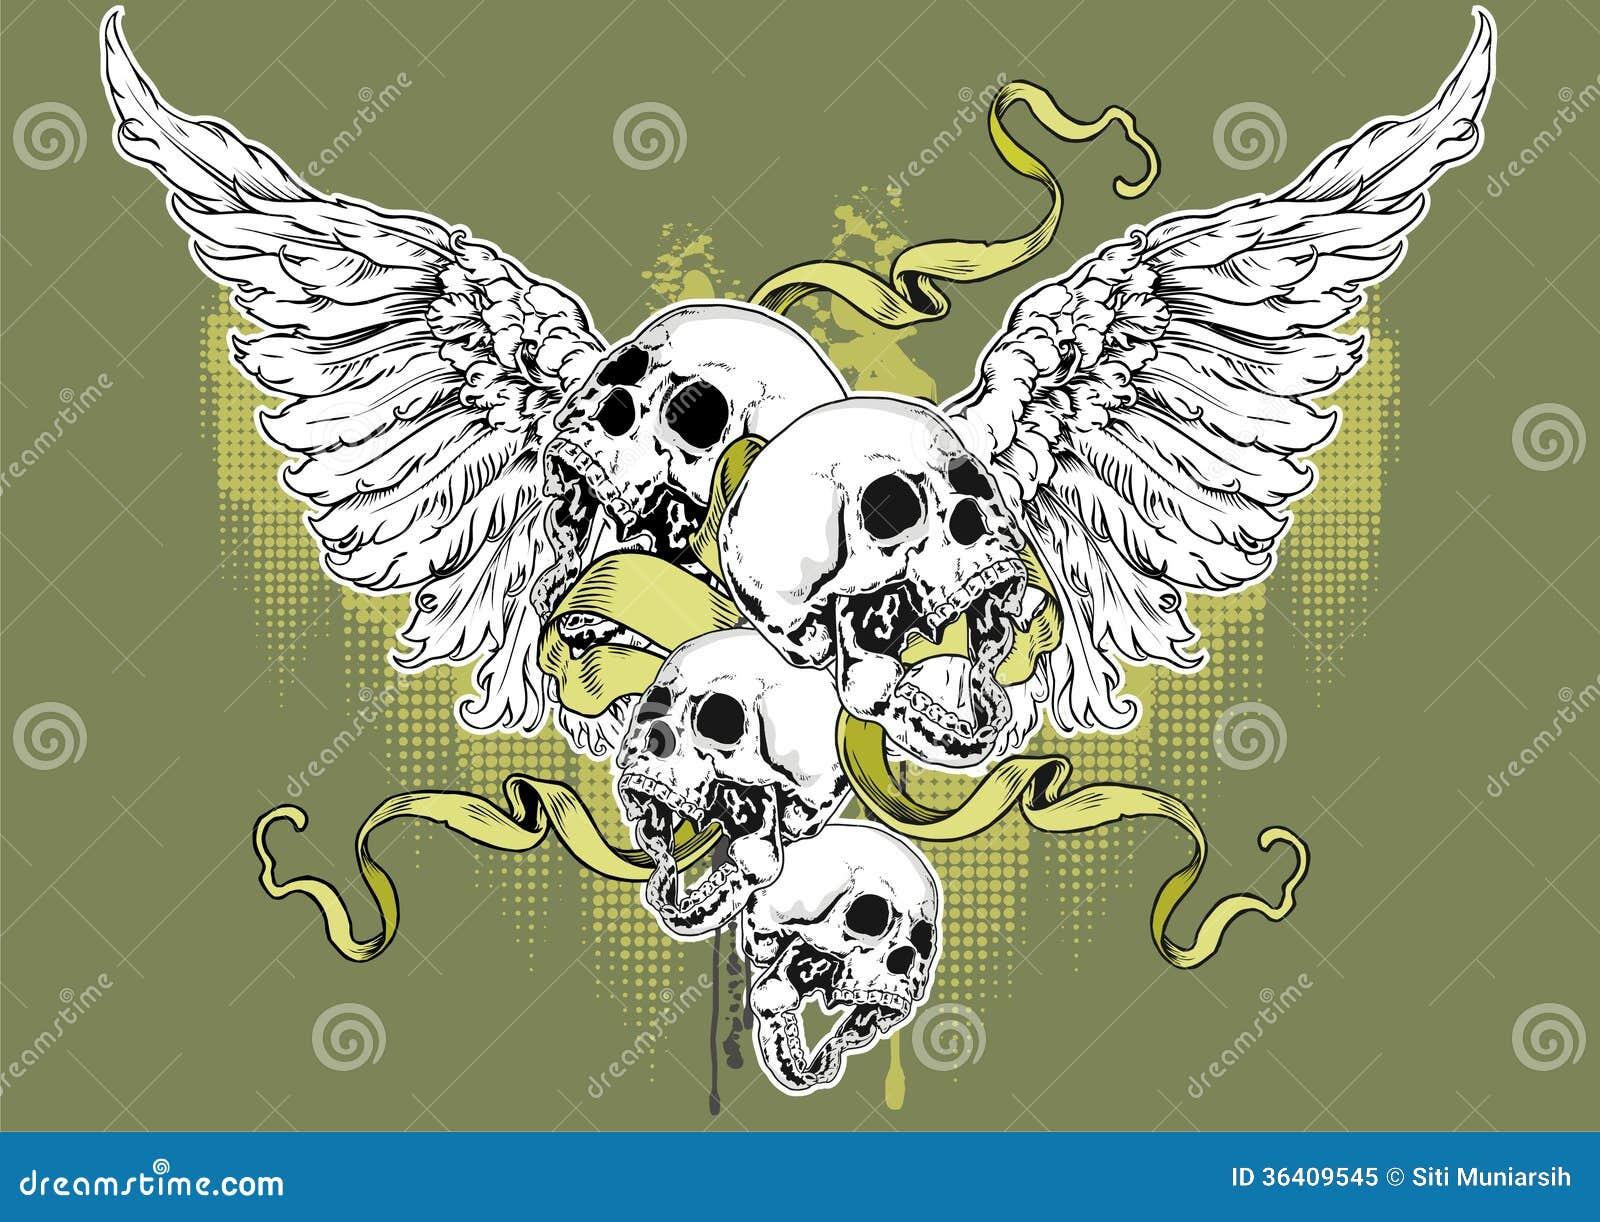 angel skull royalty free stock photo image 36409545